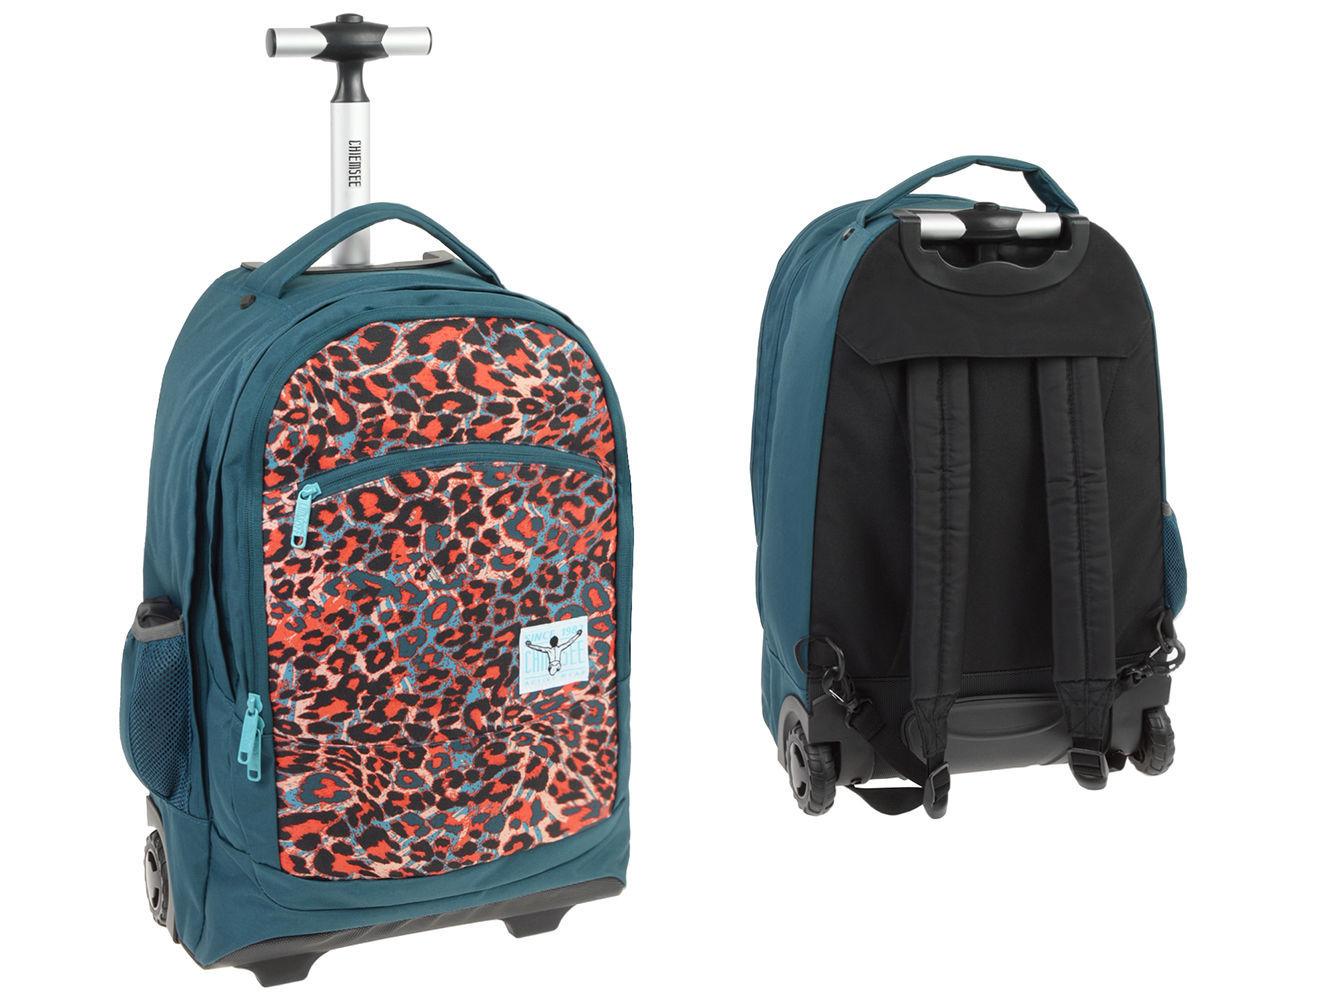 ae1a055ab83ed Chiemsee plecak szkolny na kółkach hama - 7383557498 - oficjalne ...